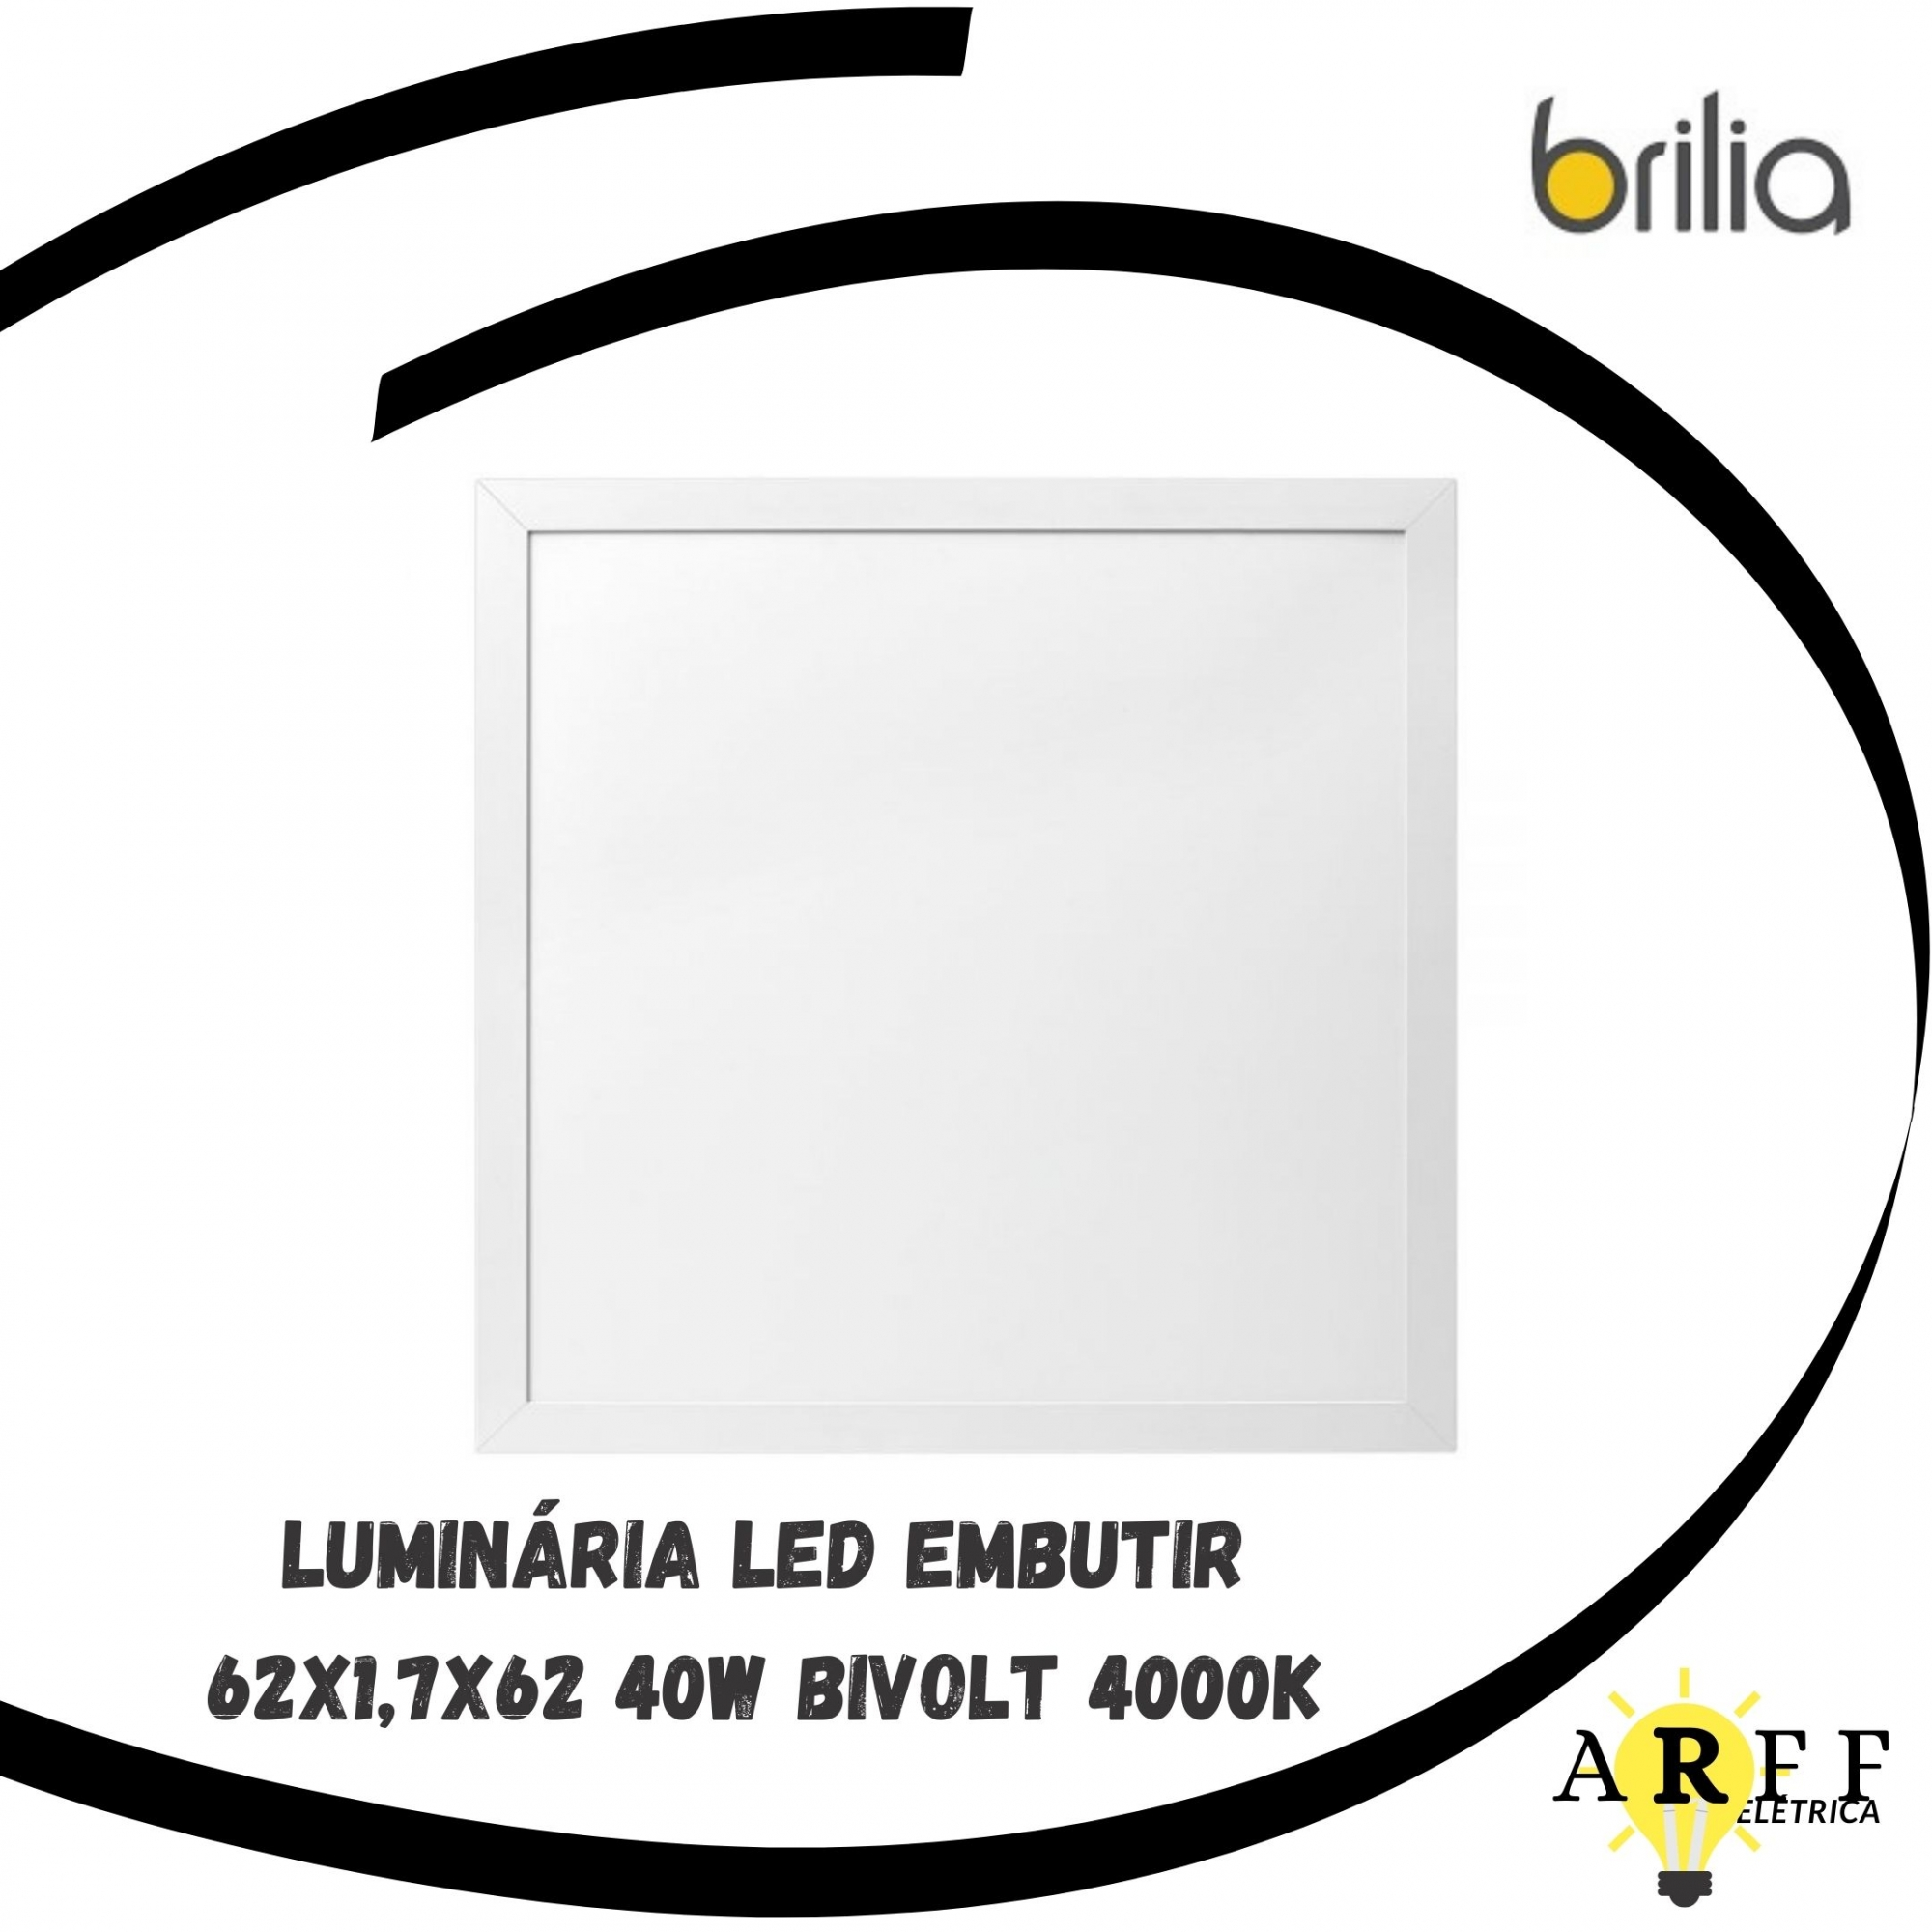 Luminaria Led Embutir 62x1,7x62 40W 4000K Bivolt BRILIA